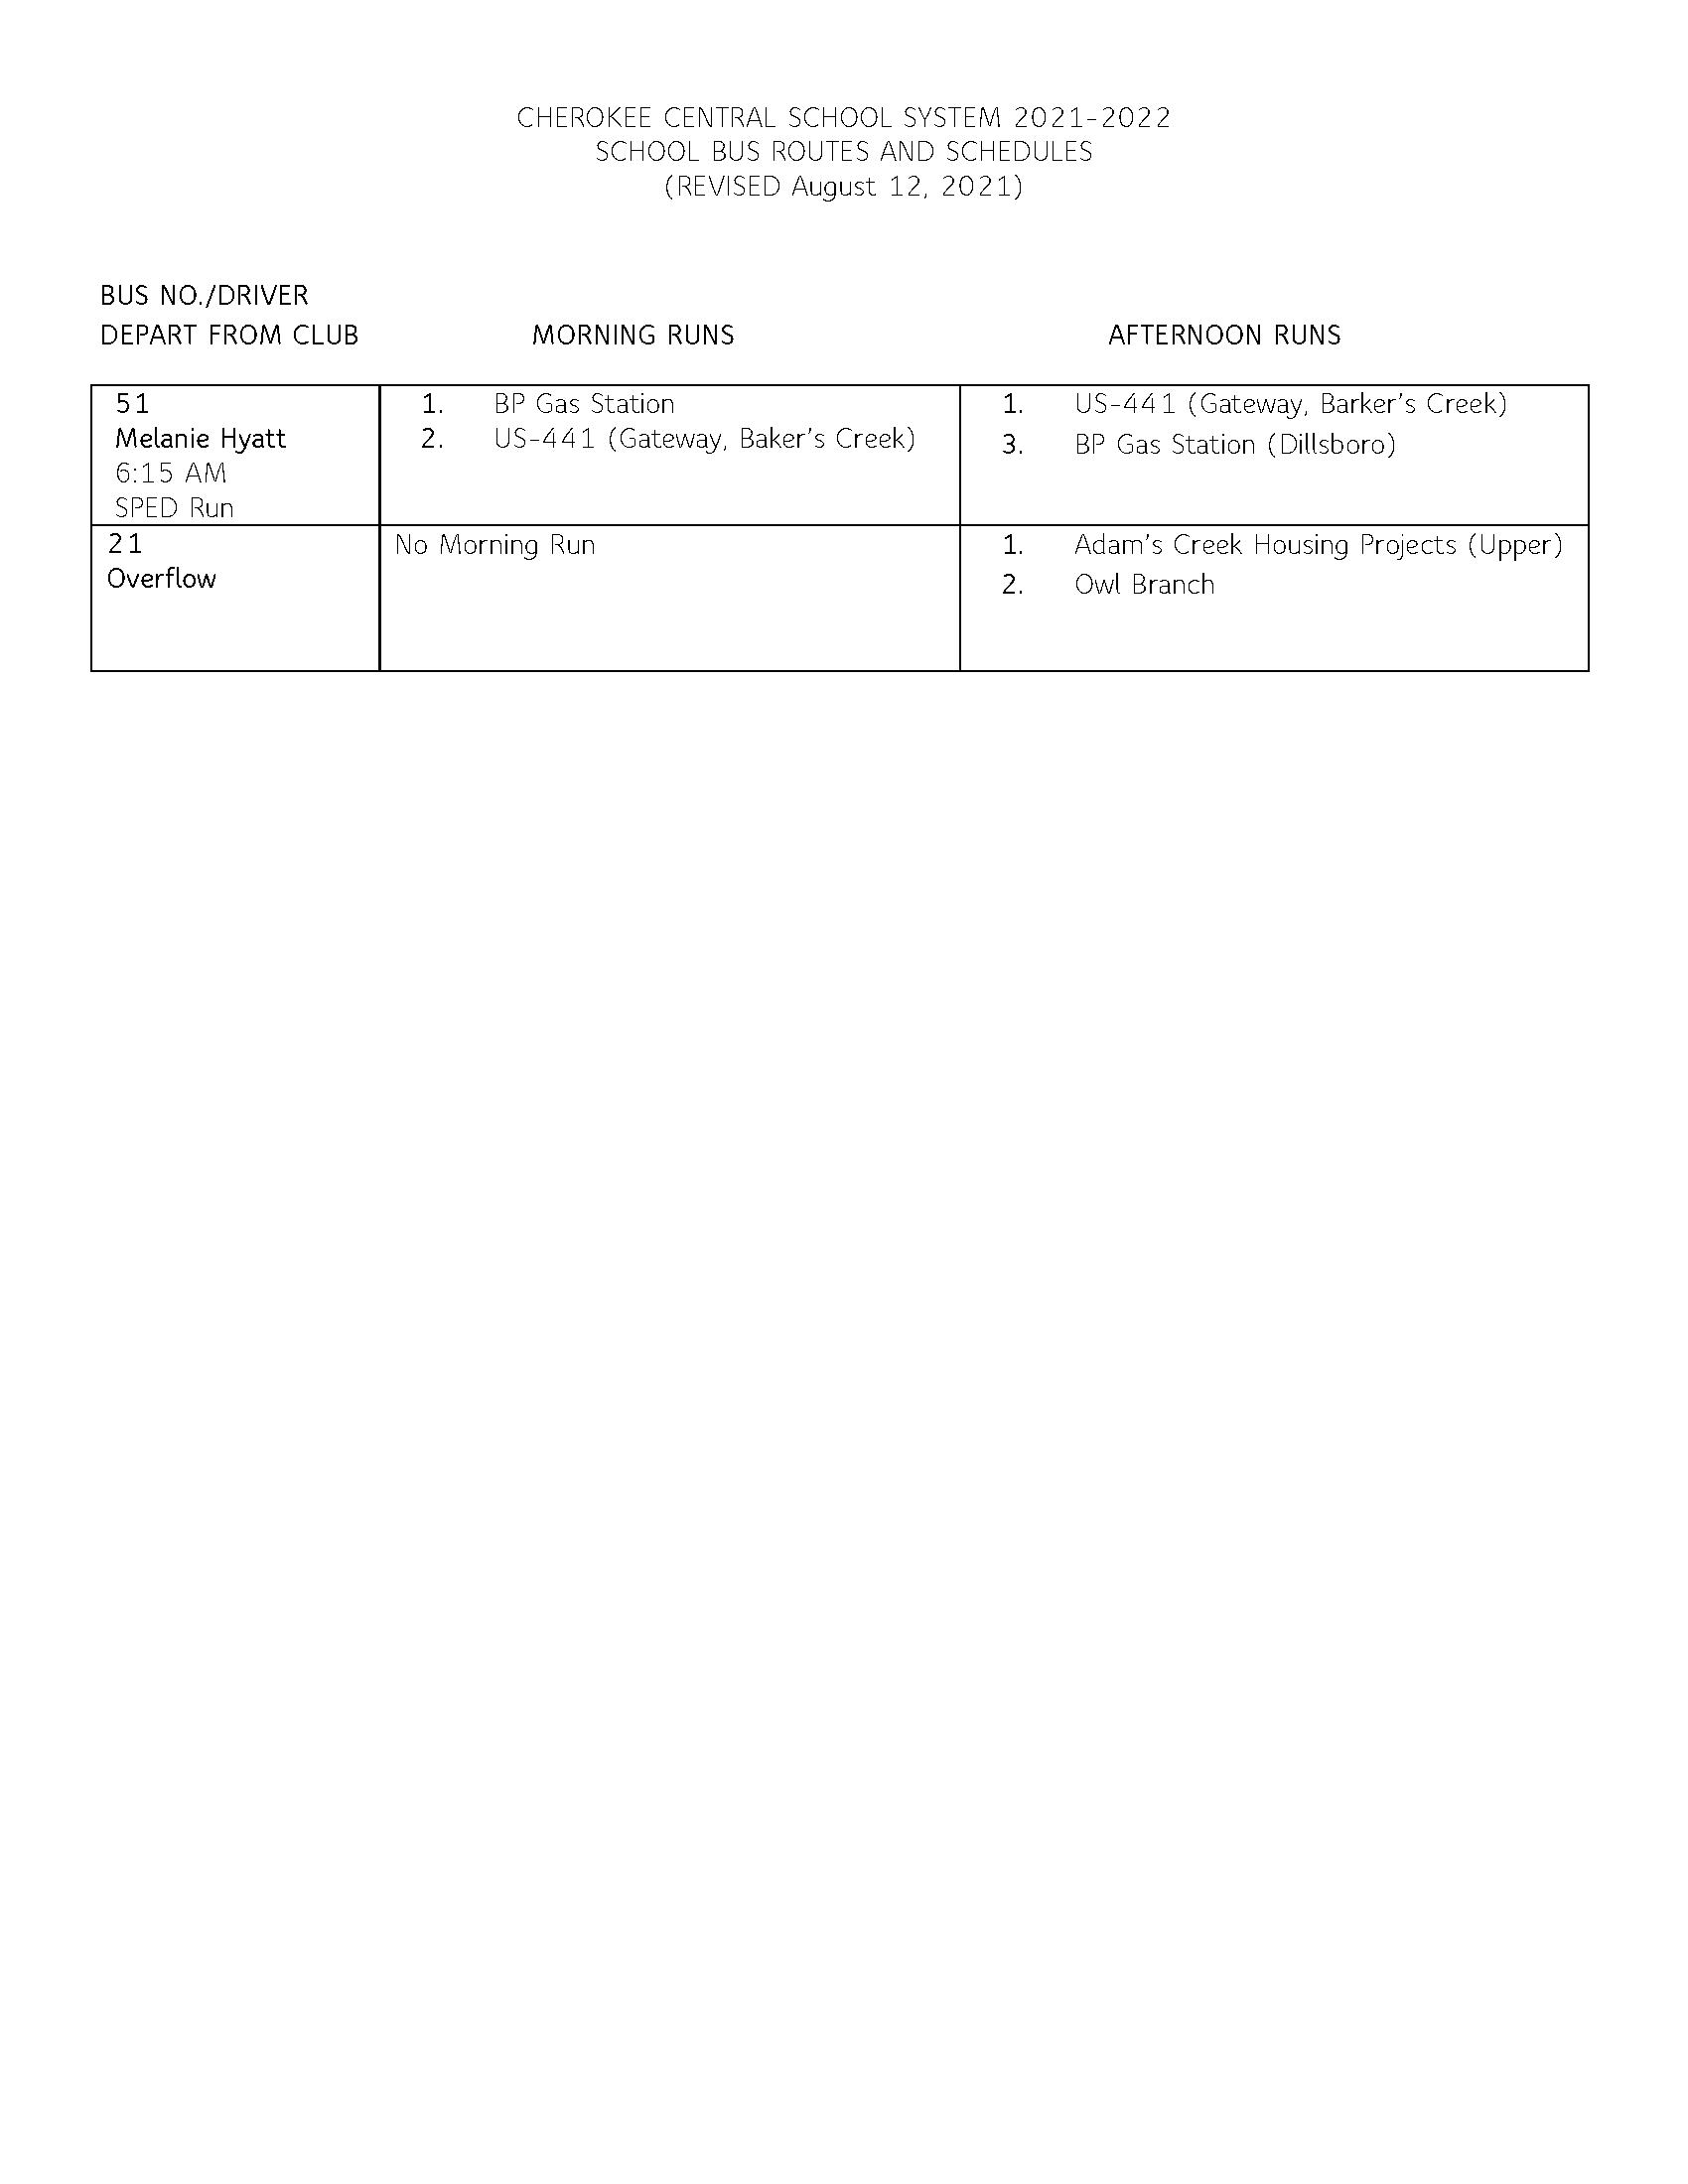 2021-2022 Bus Schedule